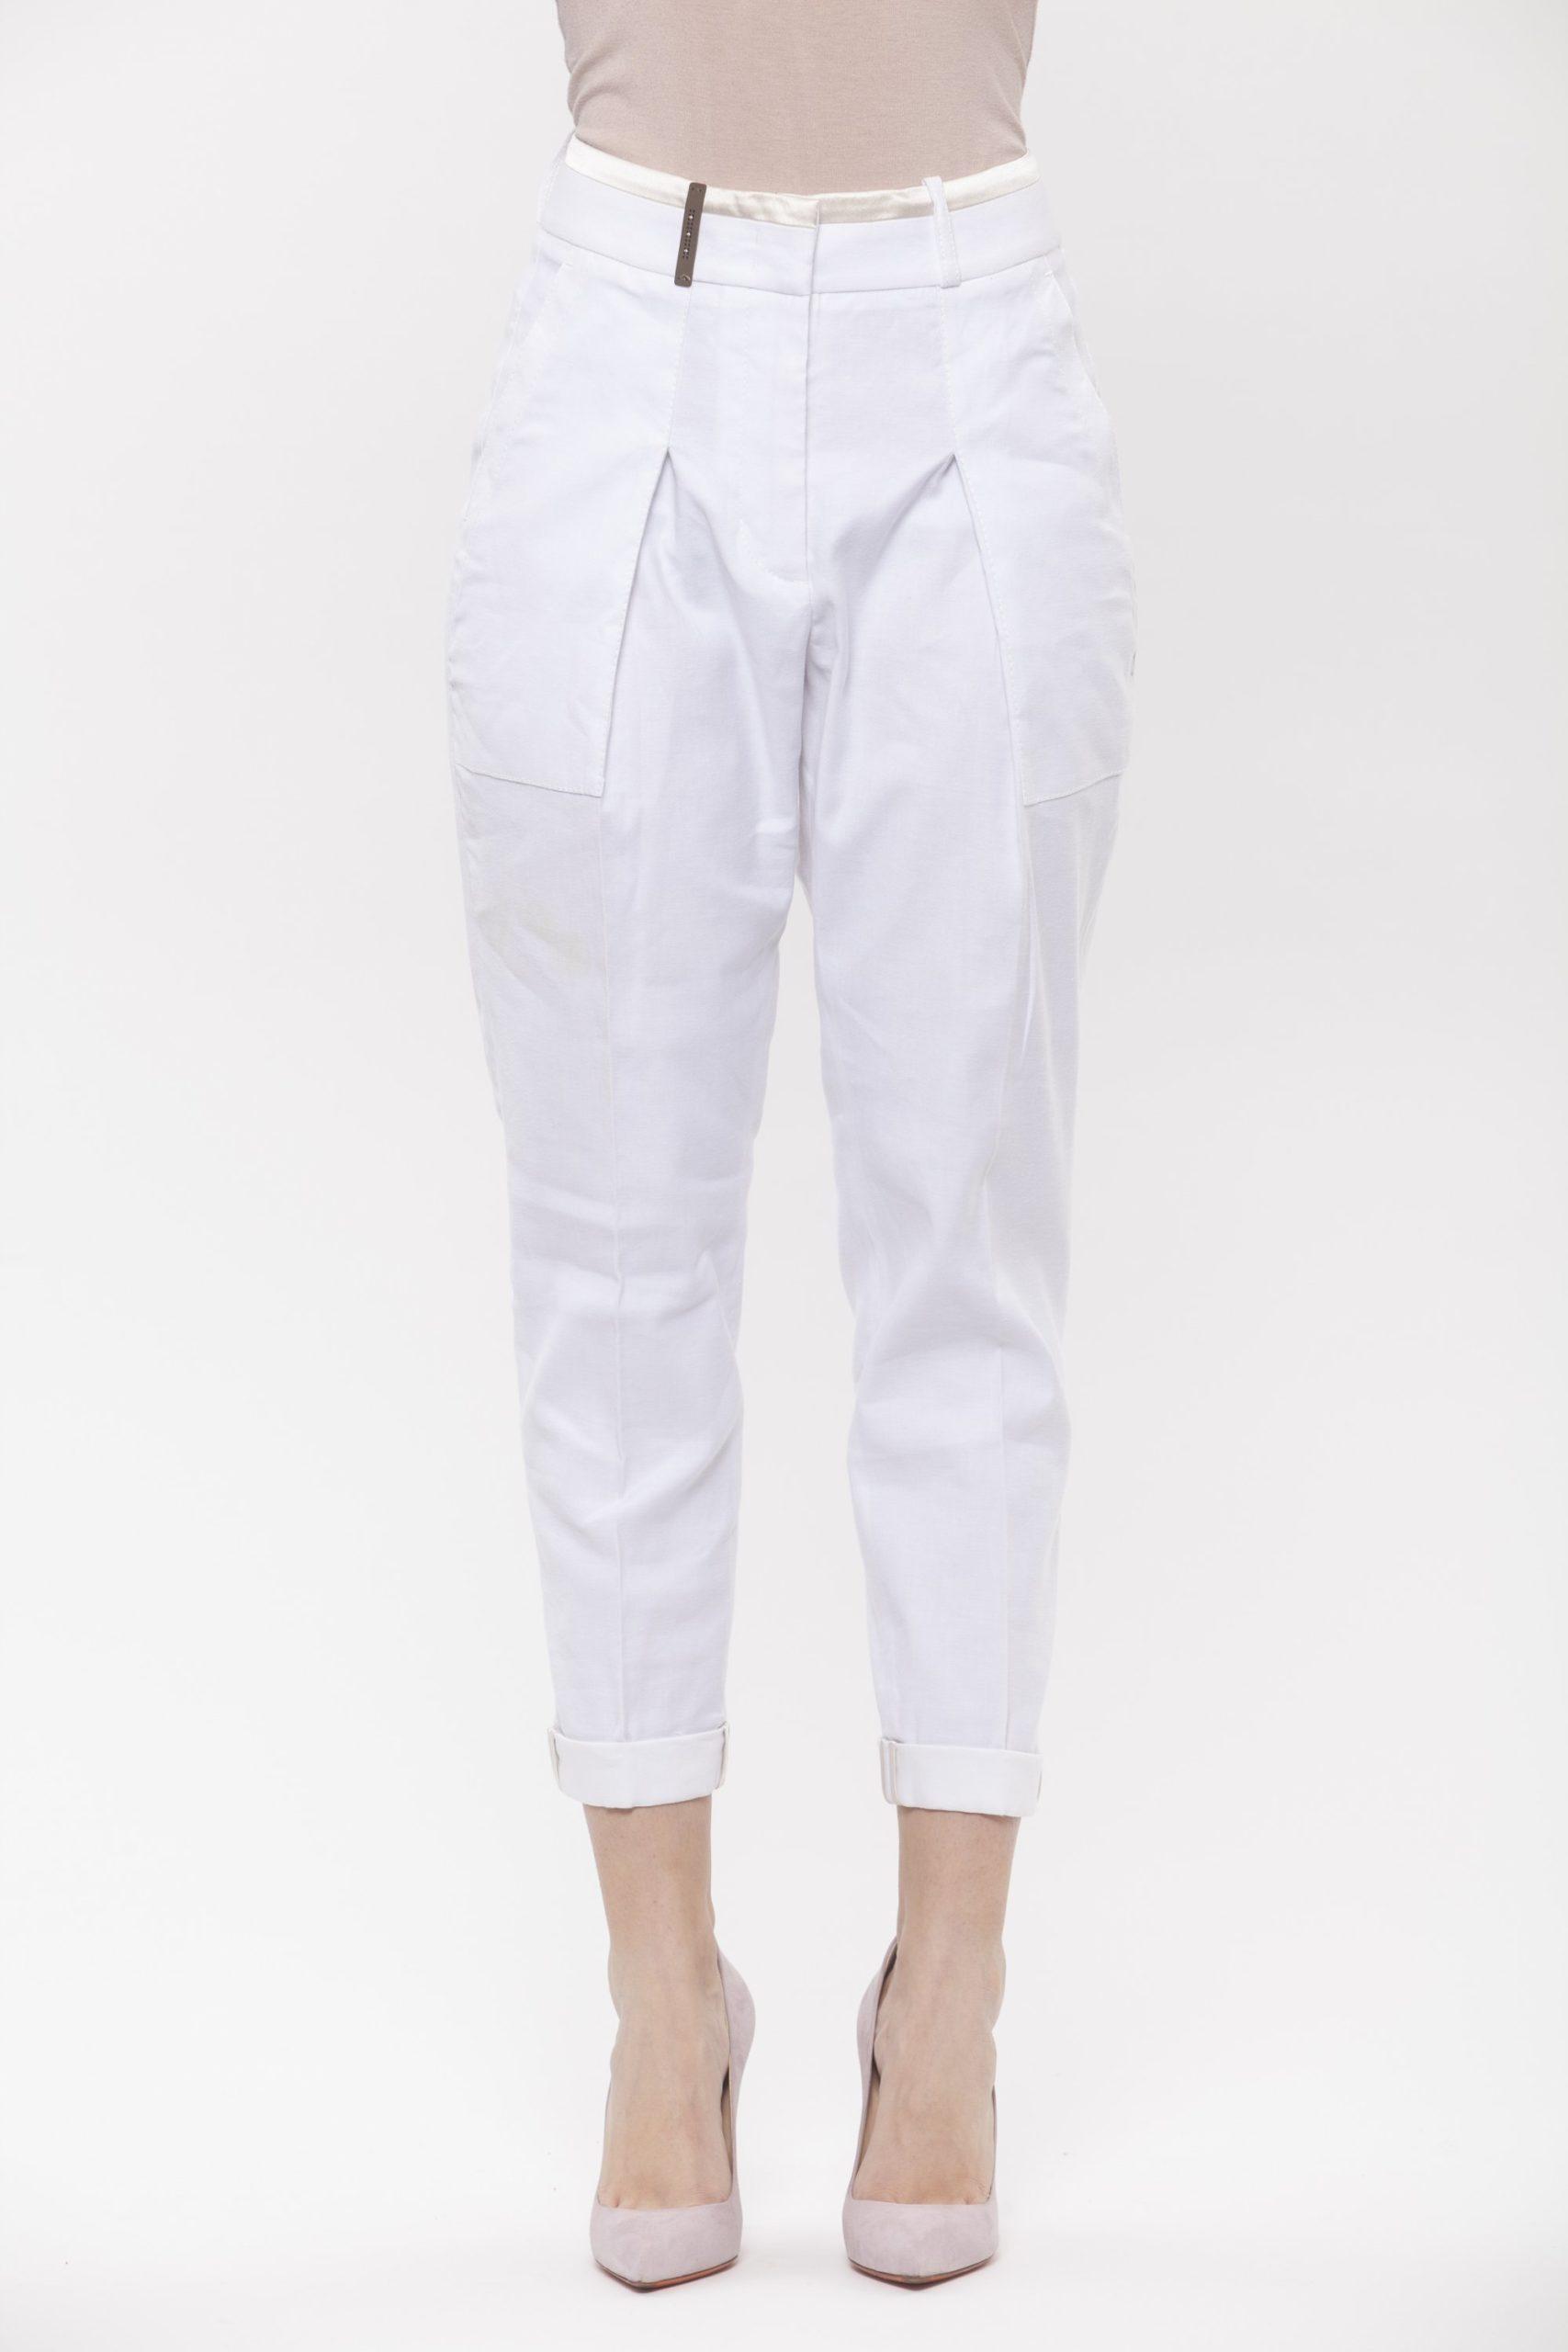 A Bianco White Jeans & Pant - IT42 | S